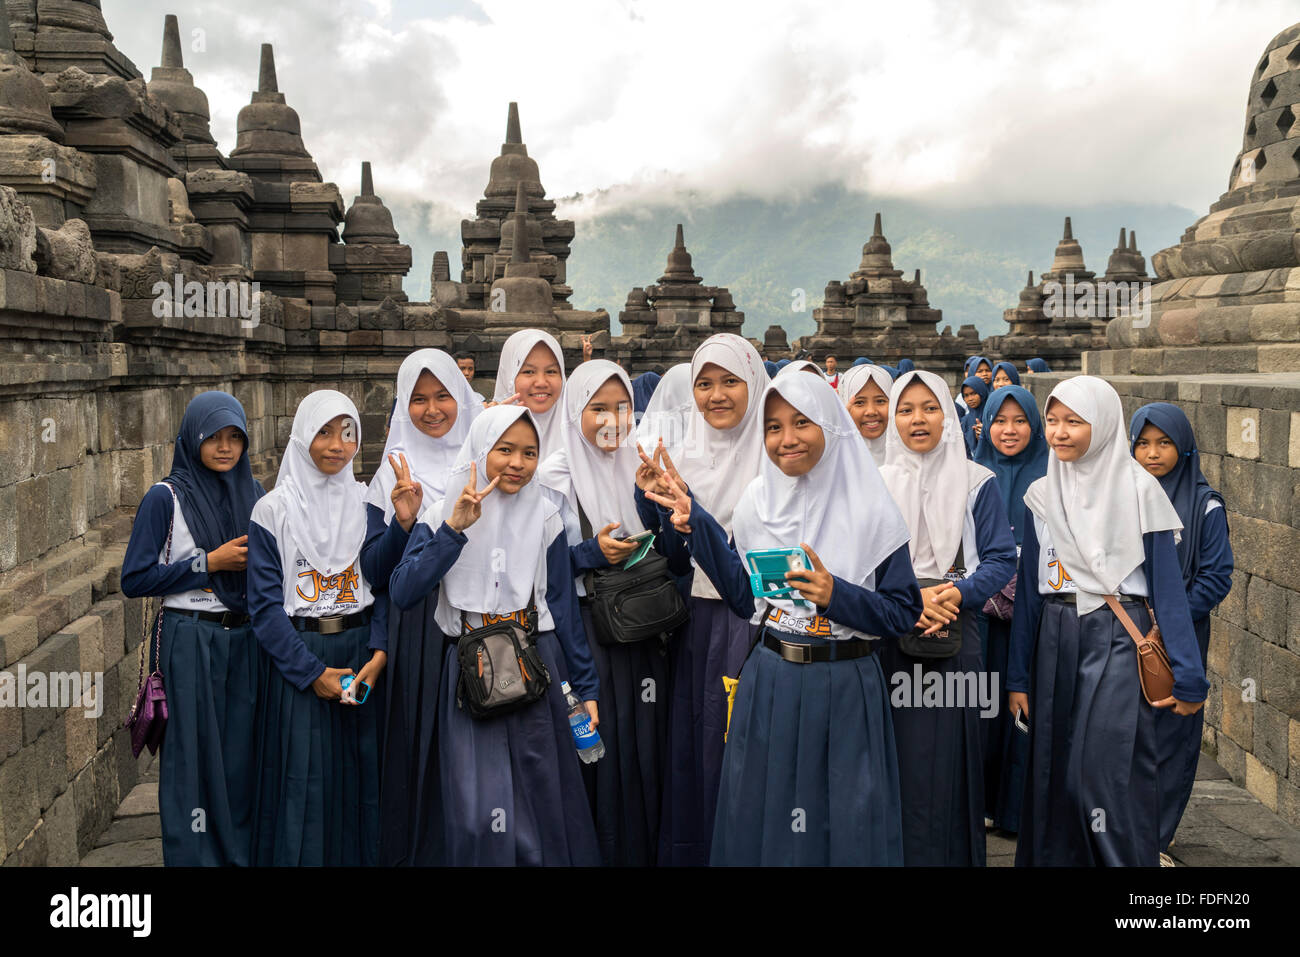 Muslim schoolgirl in uniform with headscarf, Buddhist temple complex Borobudur, Yogyakarta, Java, Indonesia, Asia - Stock Image